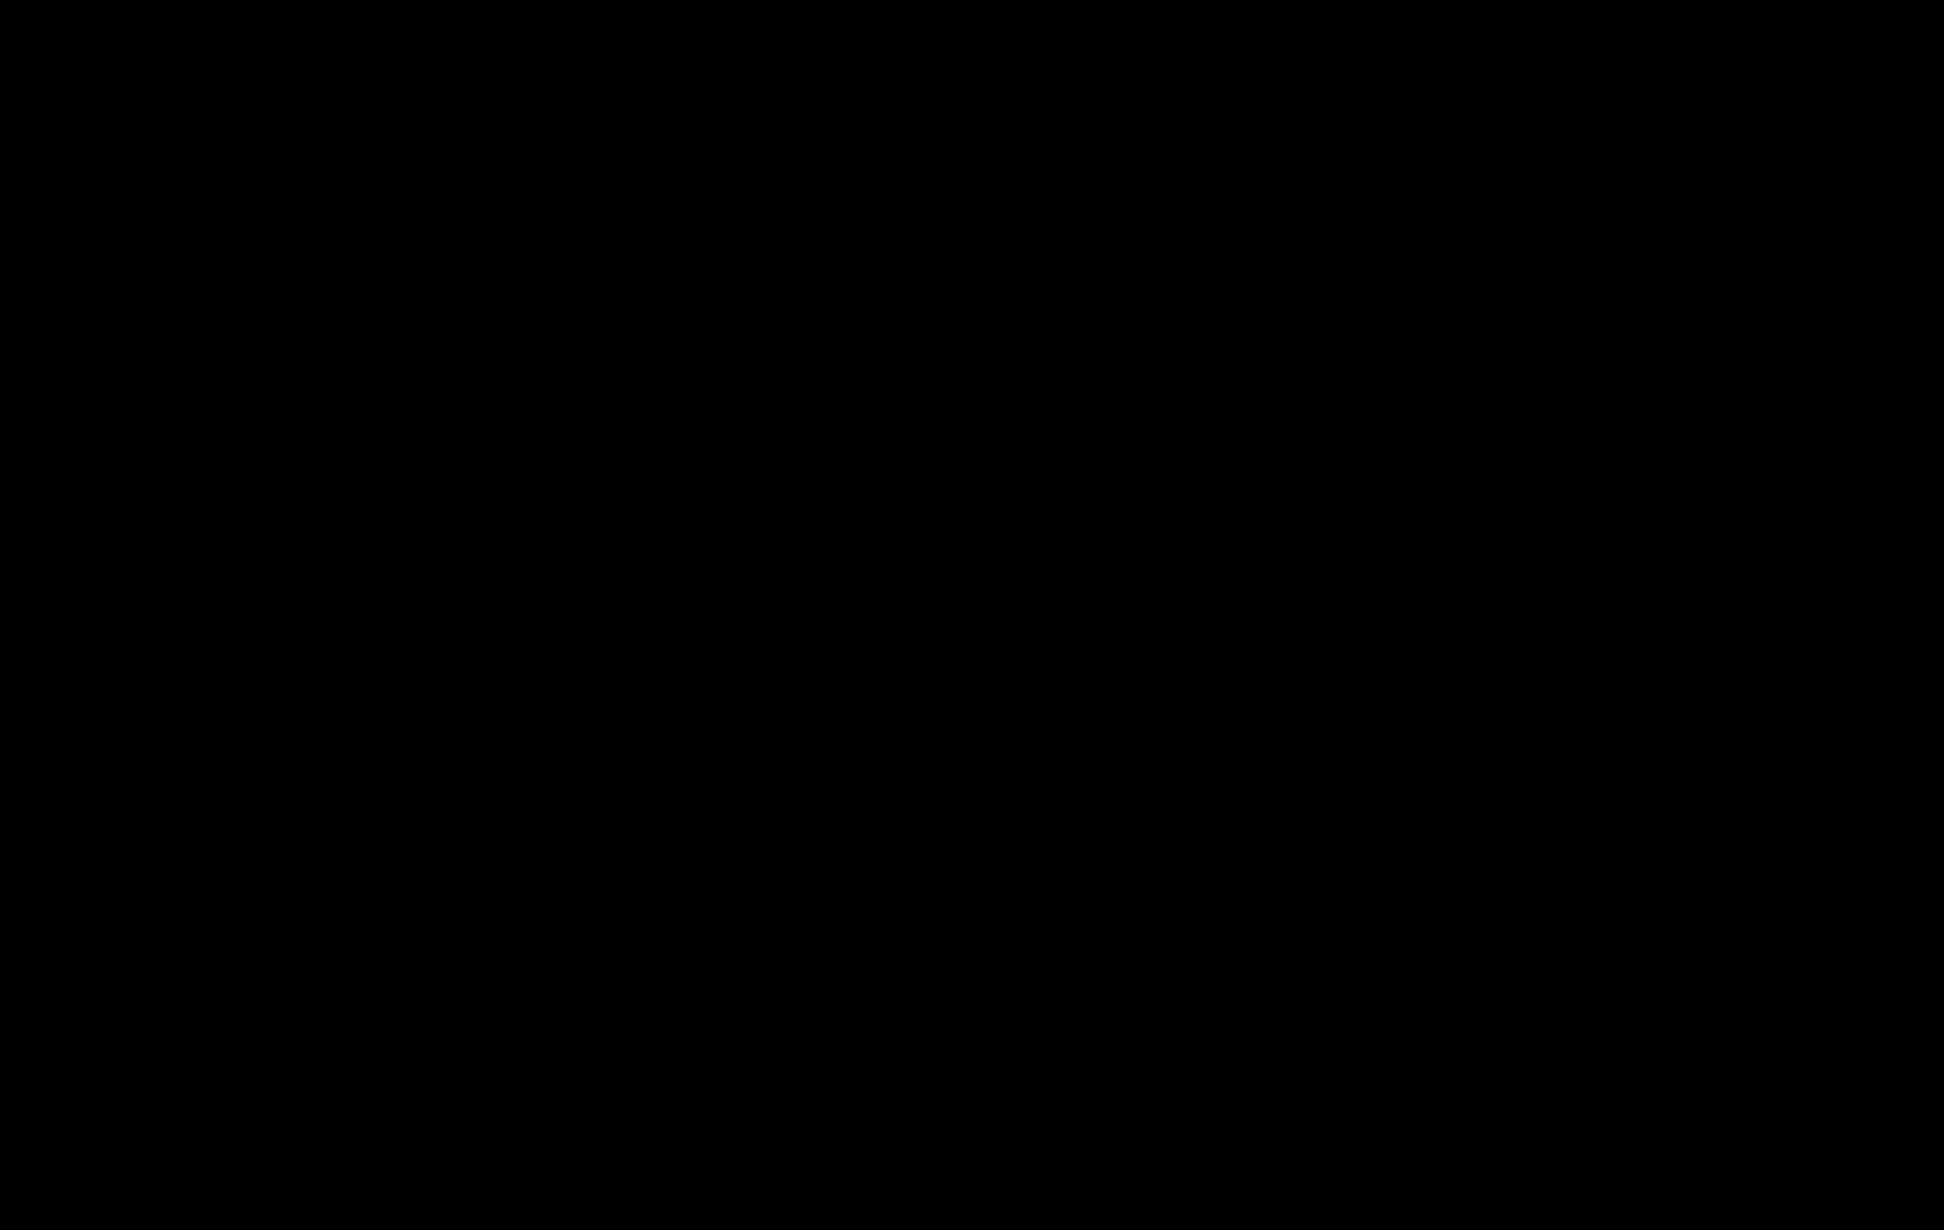 Black Eagle clipart silhouette Clipart Eagle 4 silhouette png